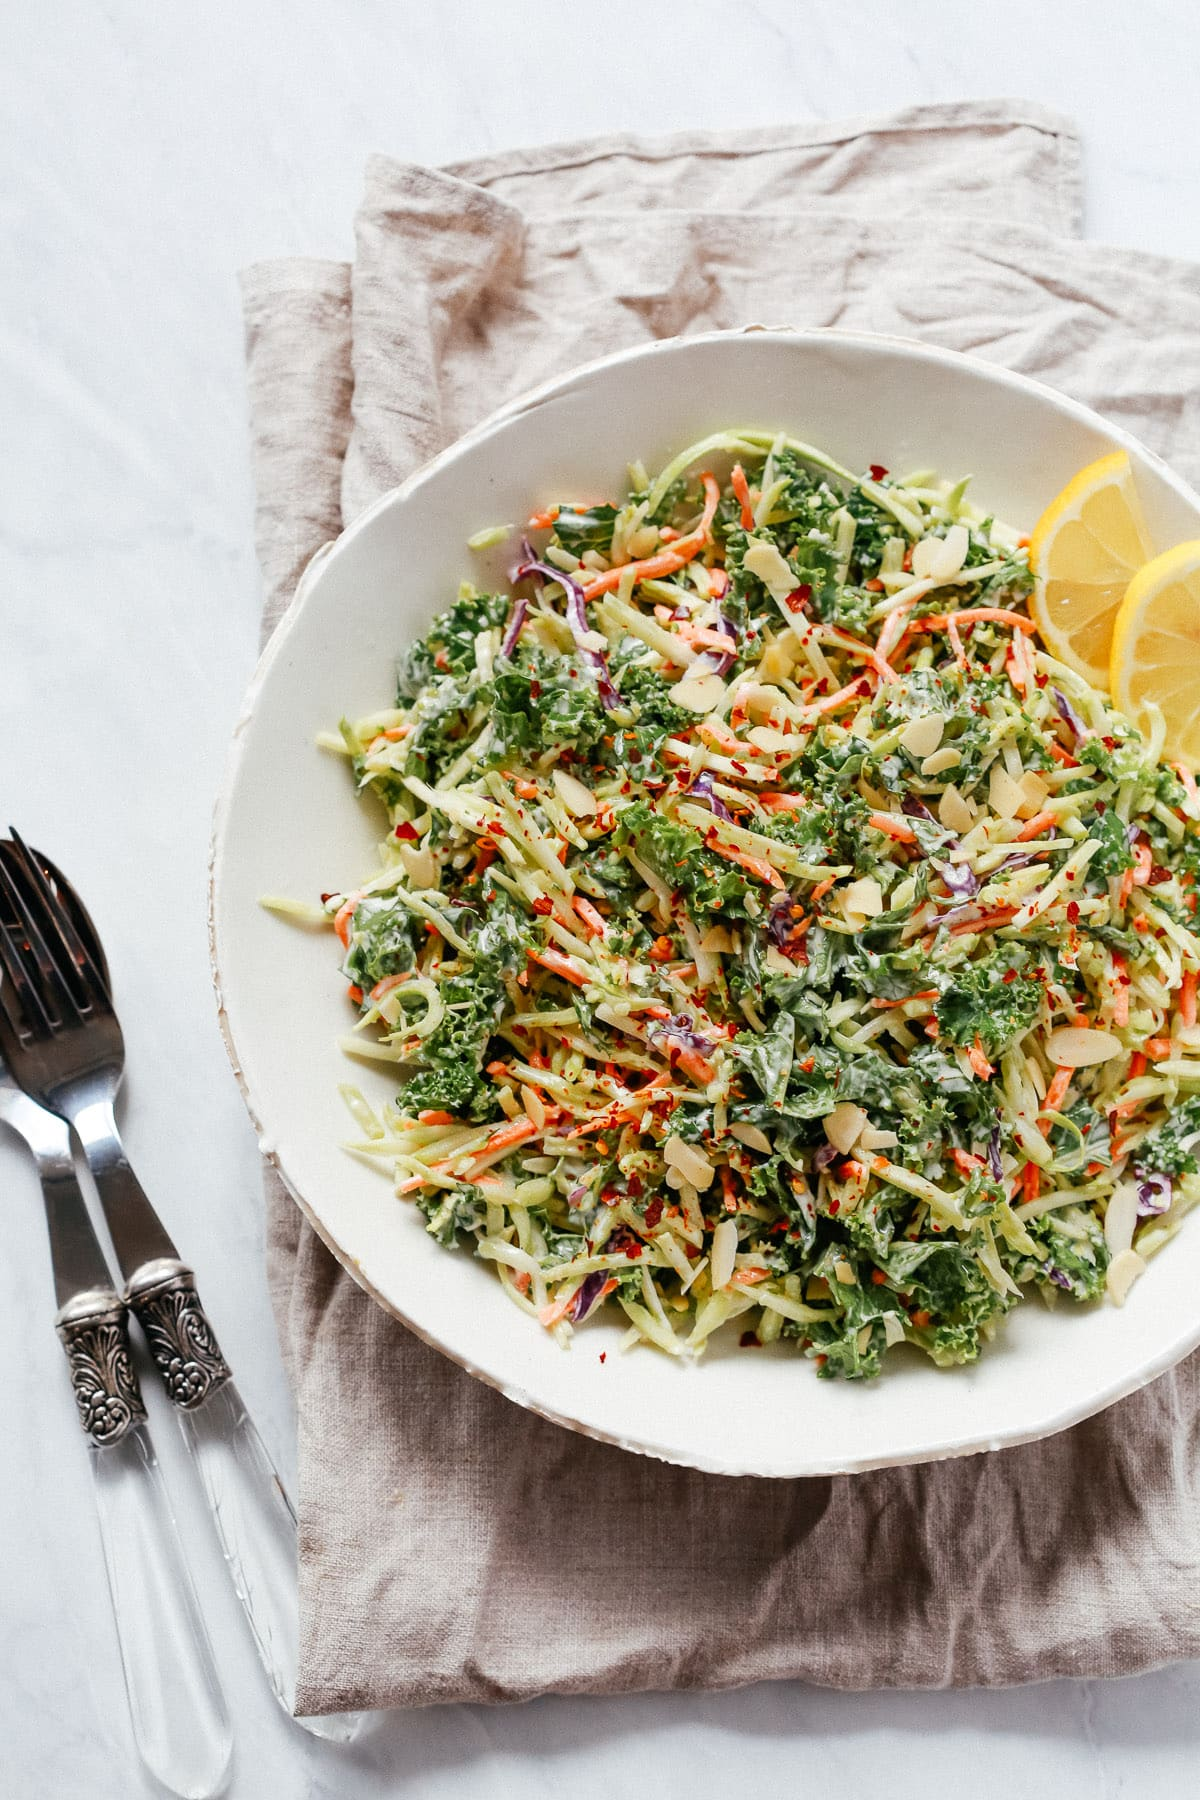 Super Easy Broccoli Kale Slaw Salad